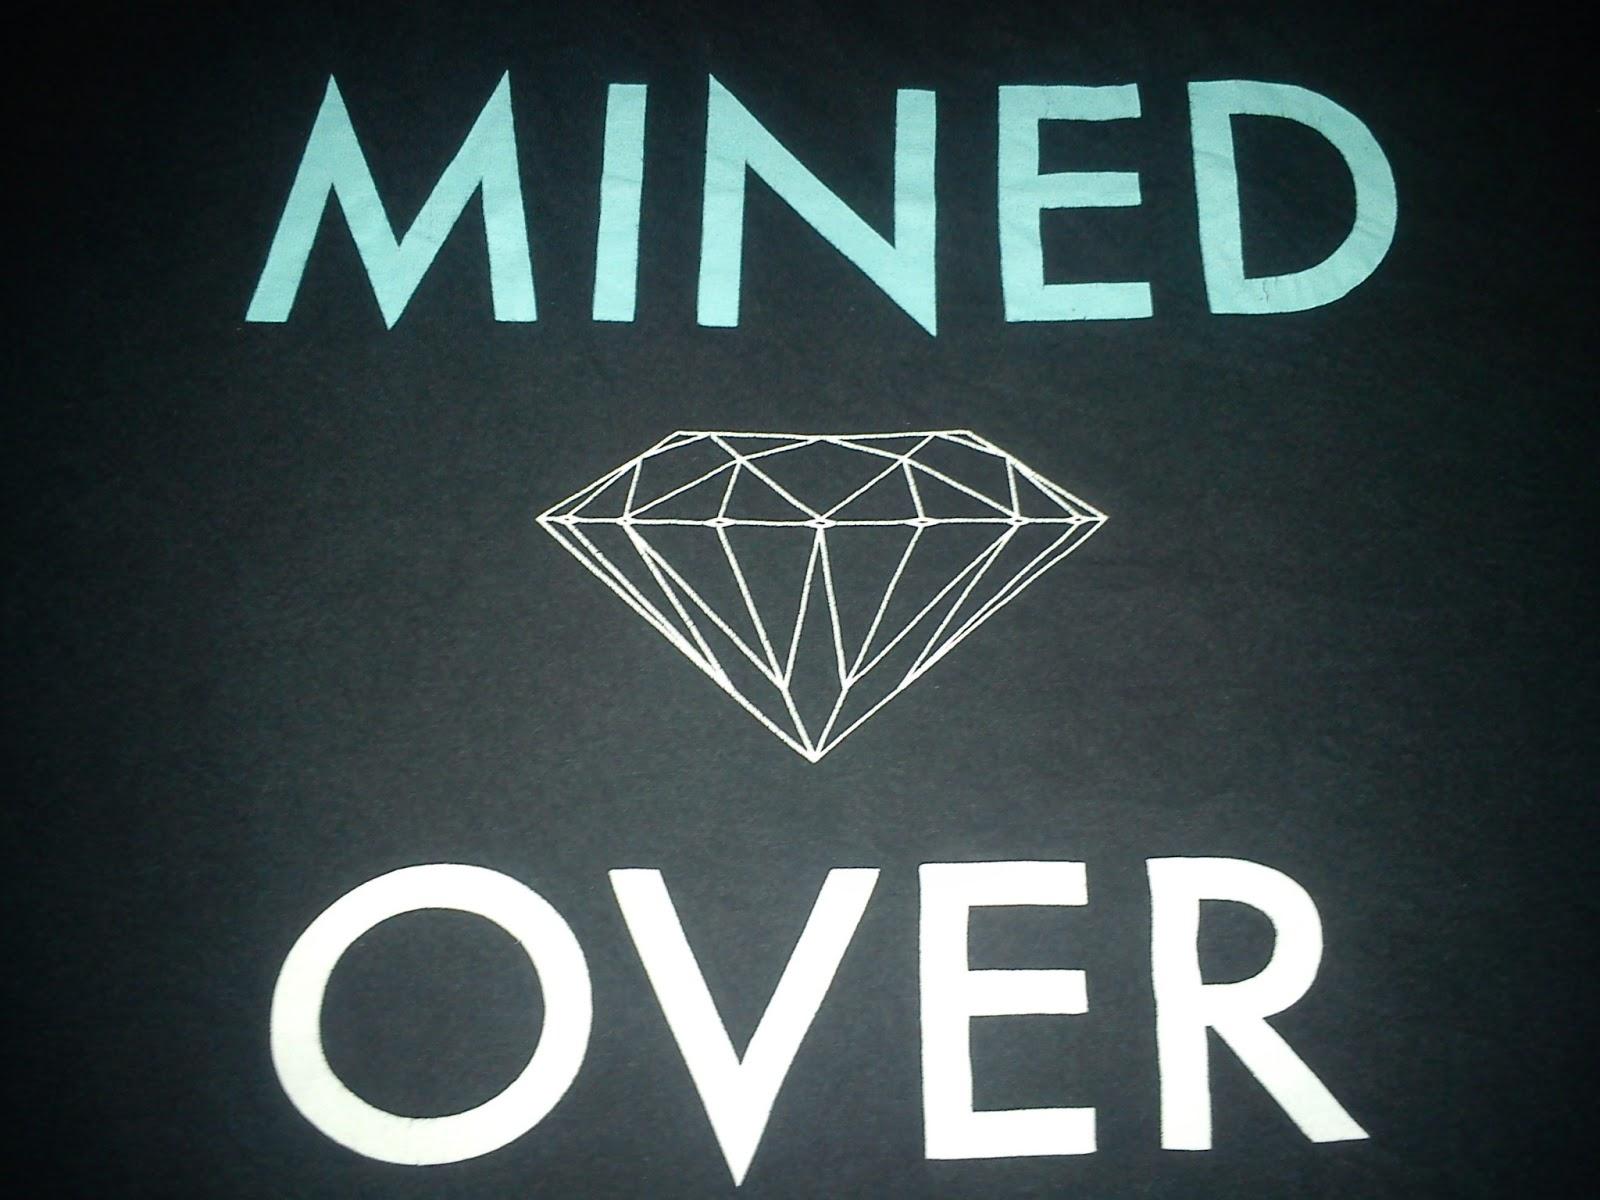 diamond logo wallpaper - photo #29